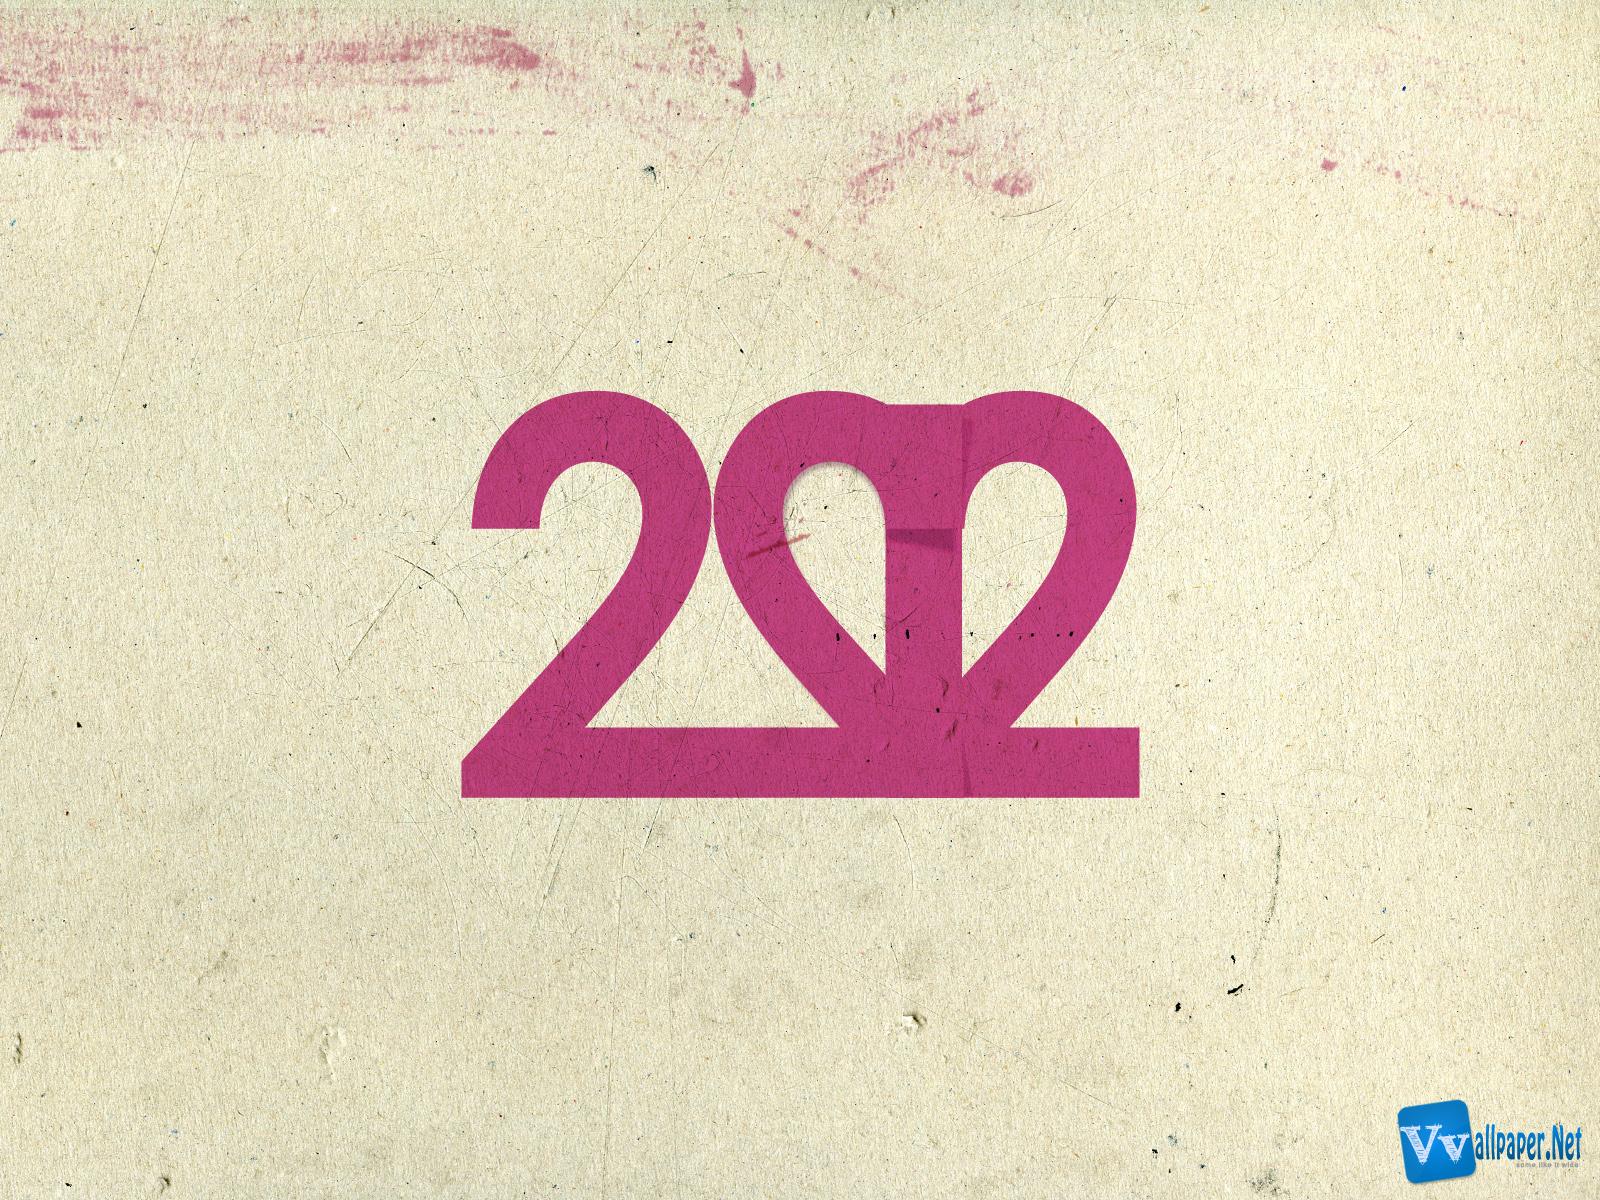 http://4.bp.blogspot.com/-knOgyoj7eGc/Ttoif0DmsZI/AAAAAAAAEtU/y4mcUmSd8b8/s1600/Simple_2012_Texture_Typography_Wallpaper-Vvallpaper.Net.jpg